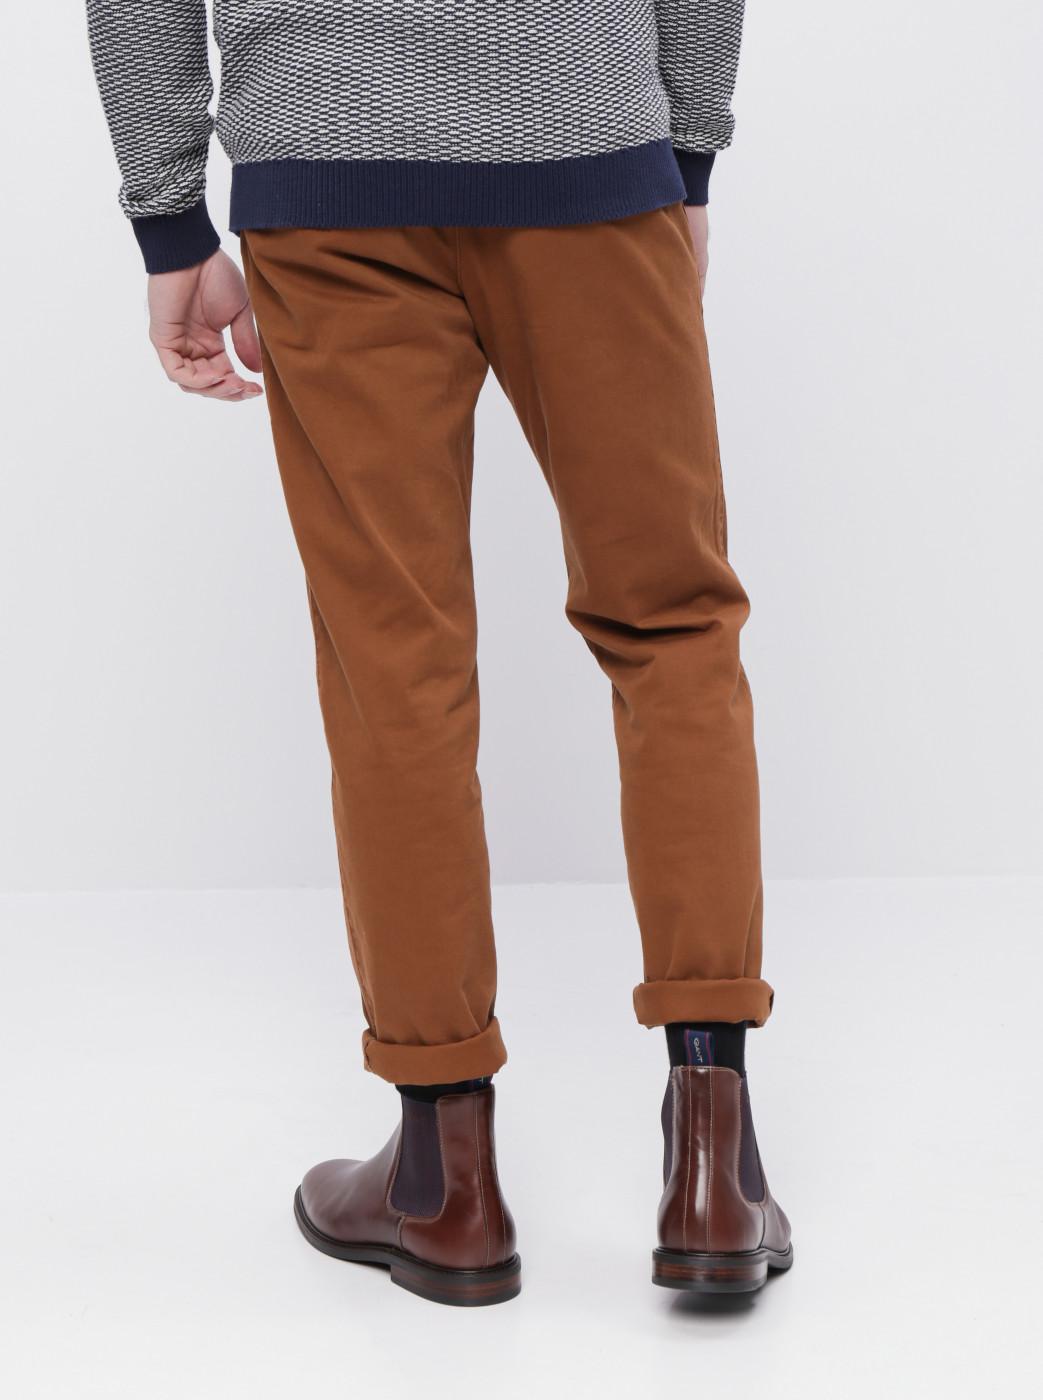 Zoot Franco Men's Brown Chino Pants